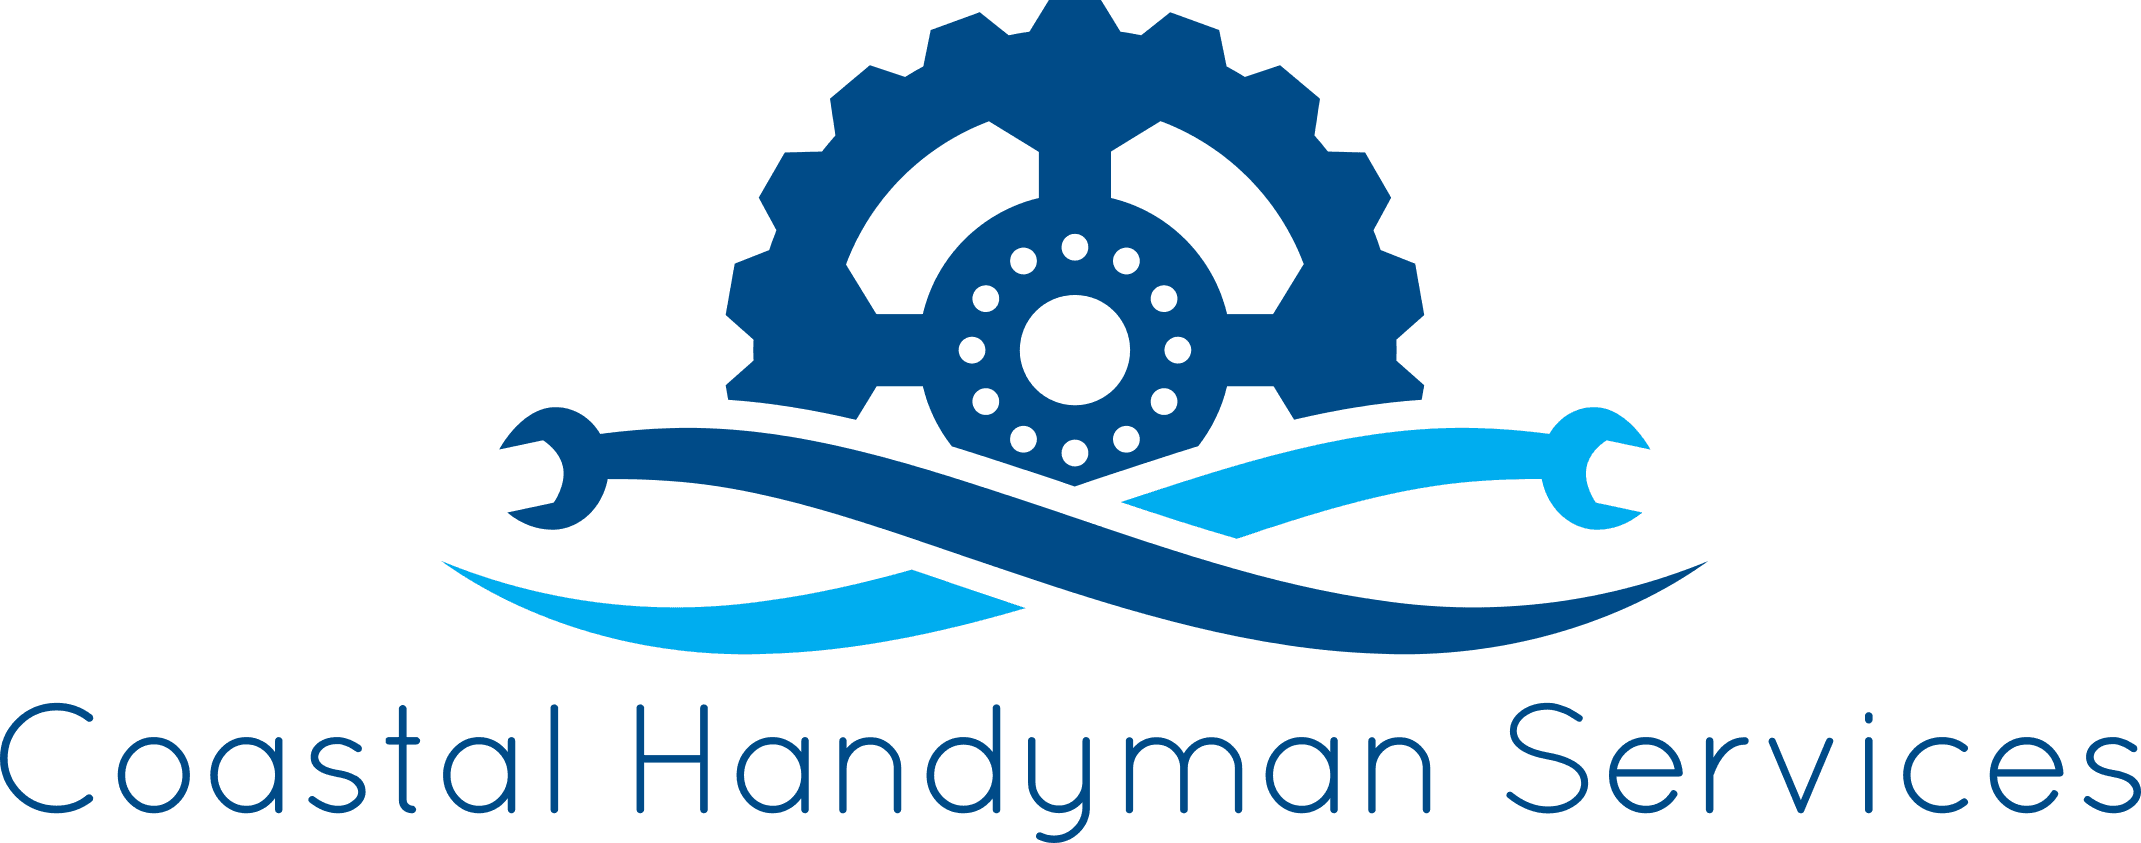 Coastal Handyman Services logo